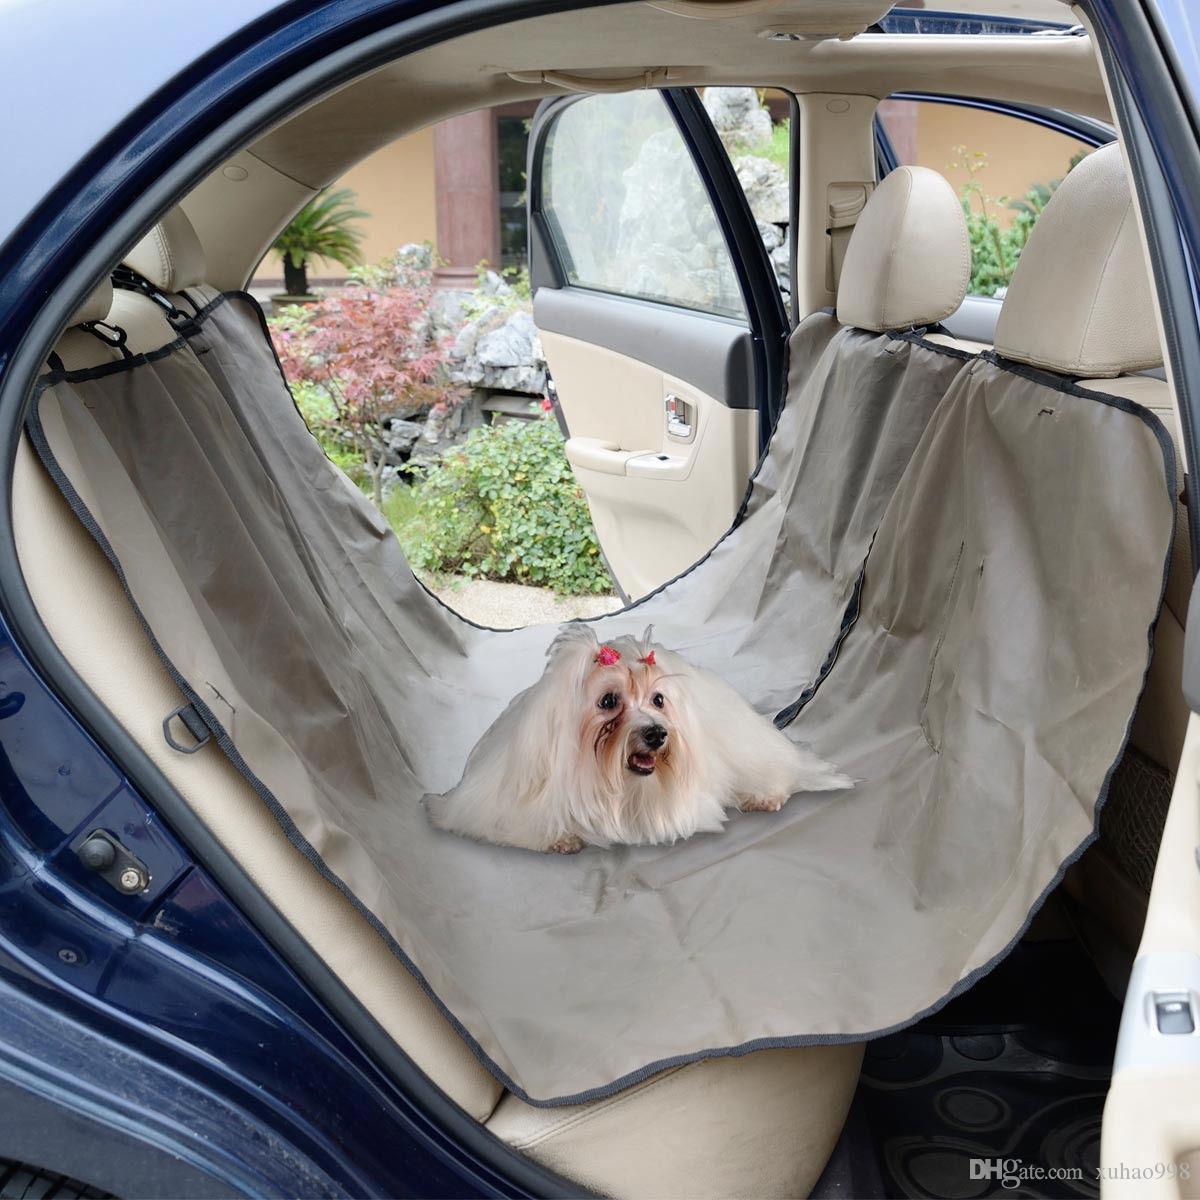 Outstanding 2019 Oxford Heavy Duty Waterproof Pet Dog Car Hammock Back Seat Cover Mat Coffee From Xuhao998 20 1 Dhgate Com Frankydiablos Diy Chair Ideas Frankydiabloscom